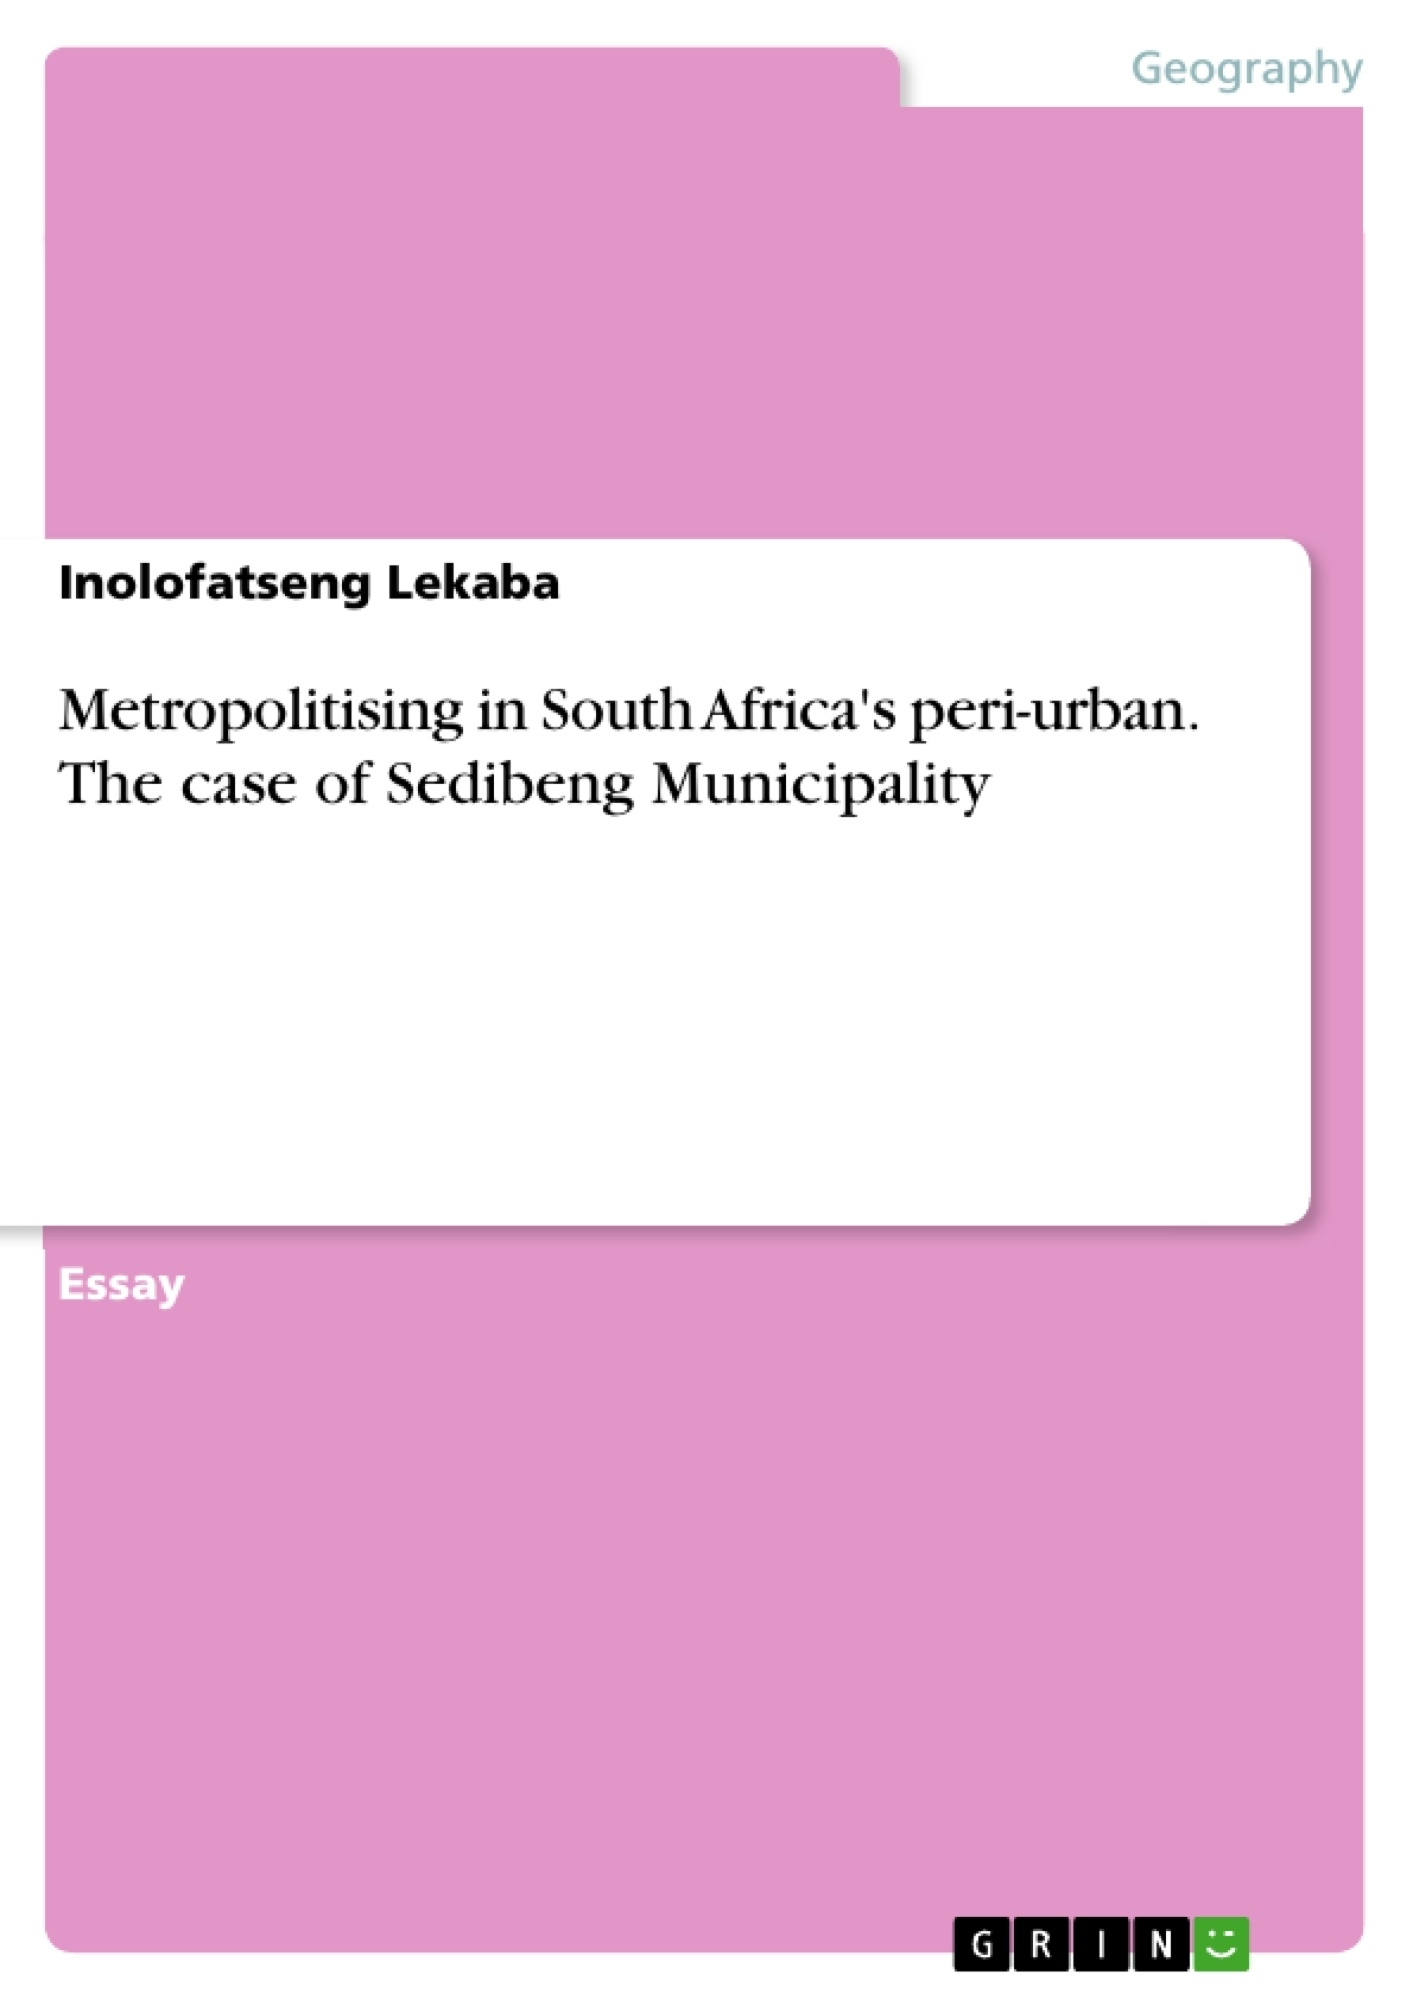 Title: Metropolitising in South Africa's peri-urban. The case of Sedibeng Municipality